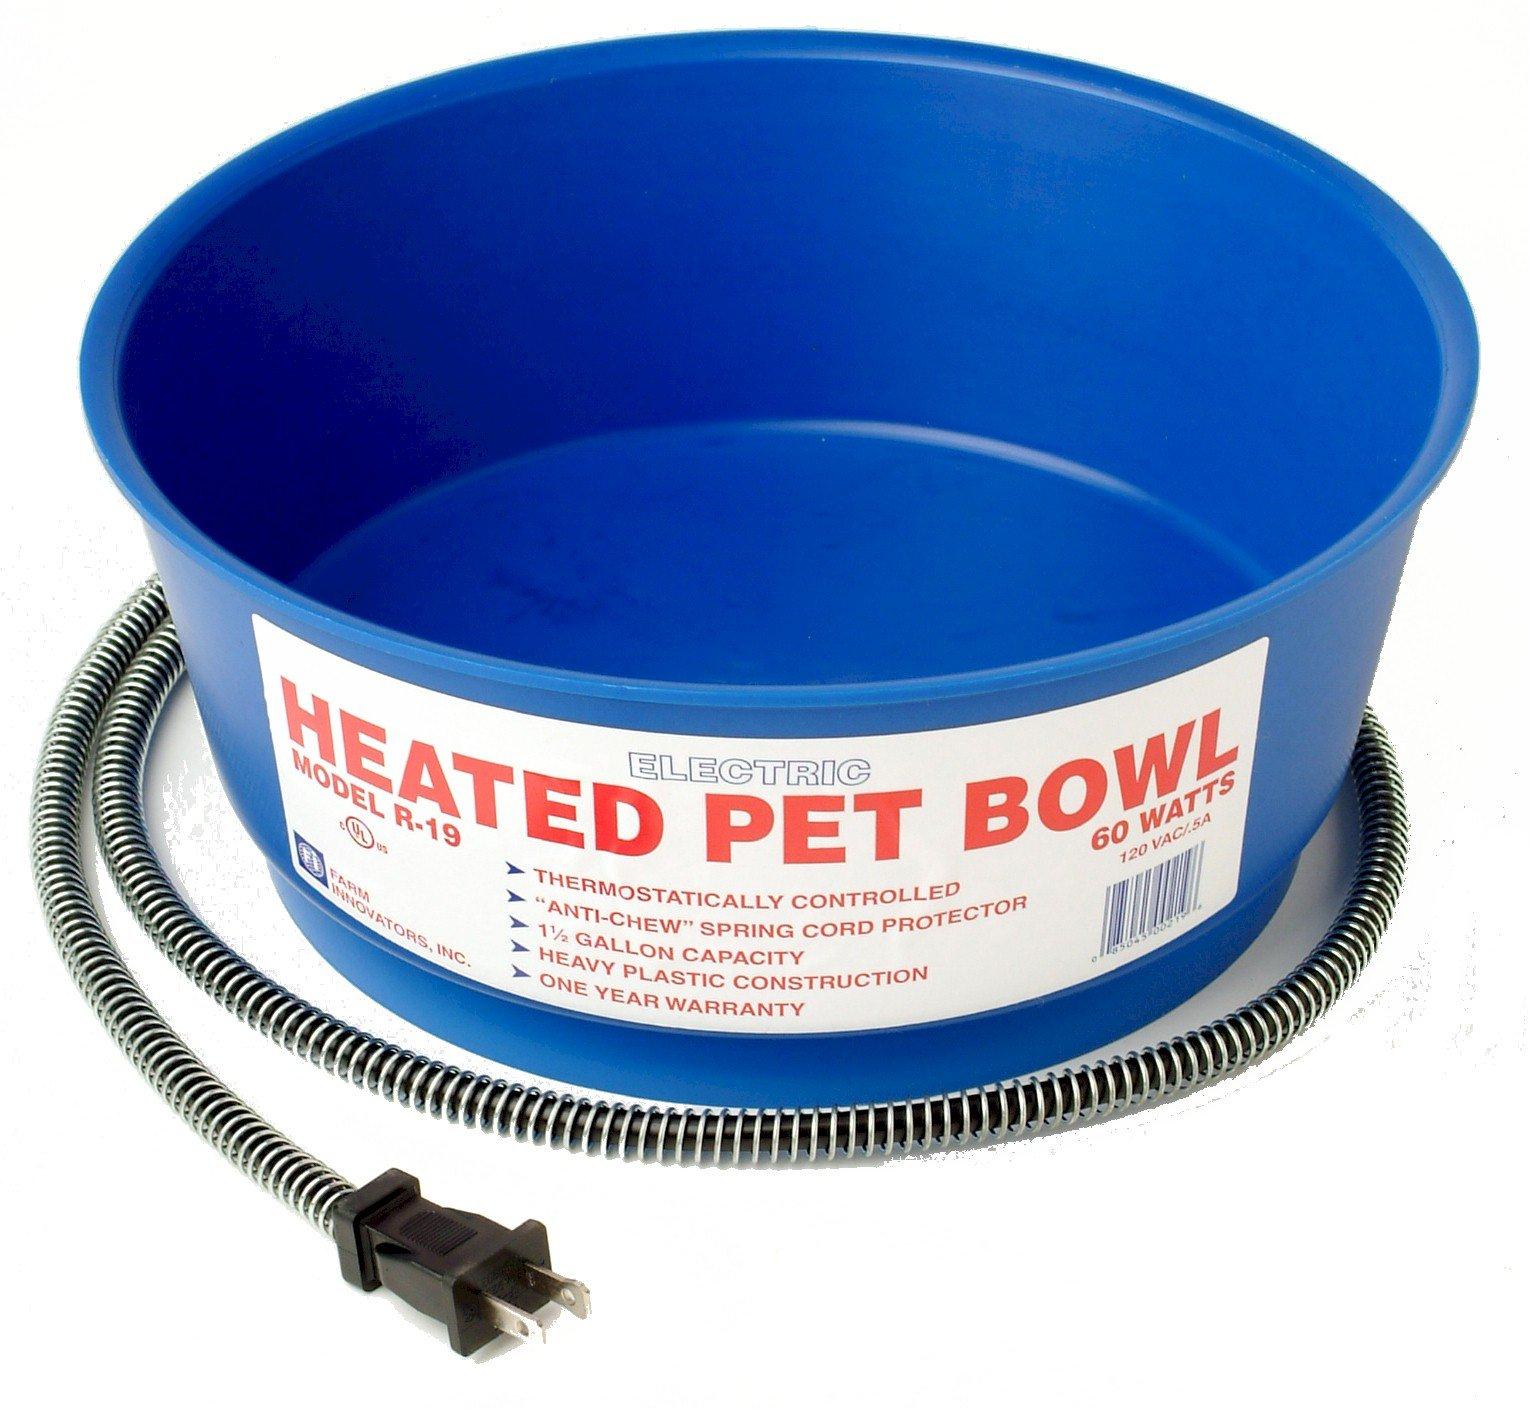 Farm Innovators Model R-19 Economical 1-1/2-Gallon Round Heated Pet Bowl, Blue, 60-Watt by Farm Innovators